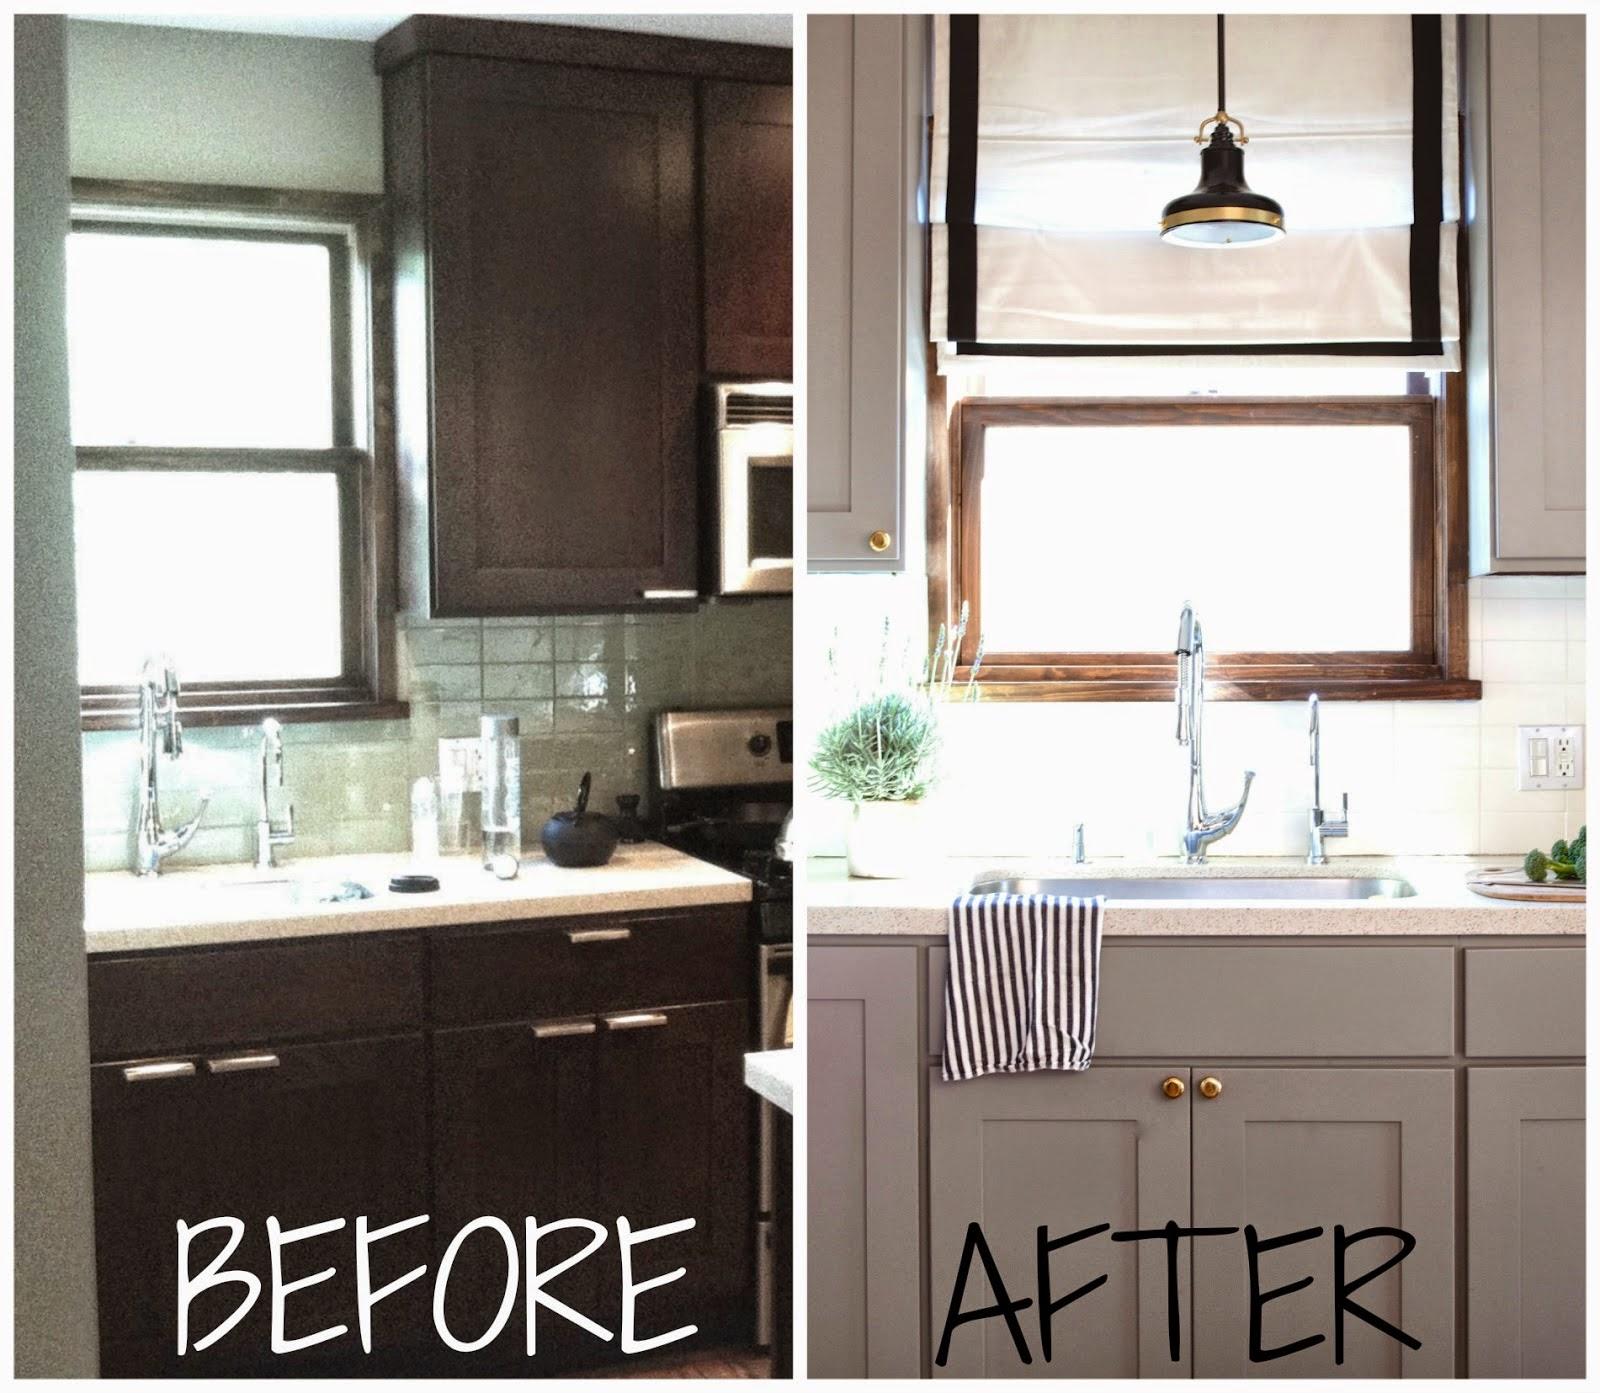 entire nitty gritty kitchen remodel catch kitchen backsplash colorful painted diy kitchen backsplash kitchen